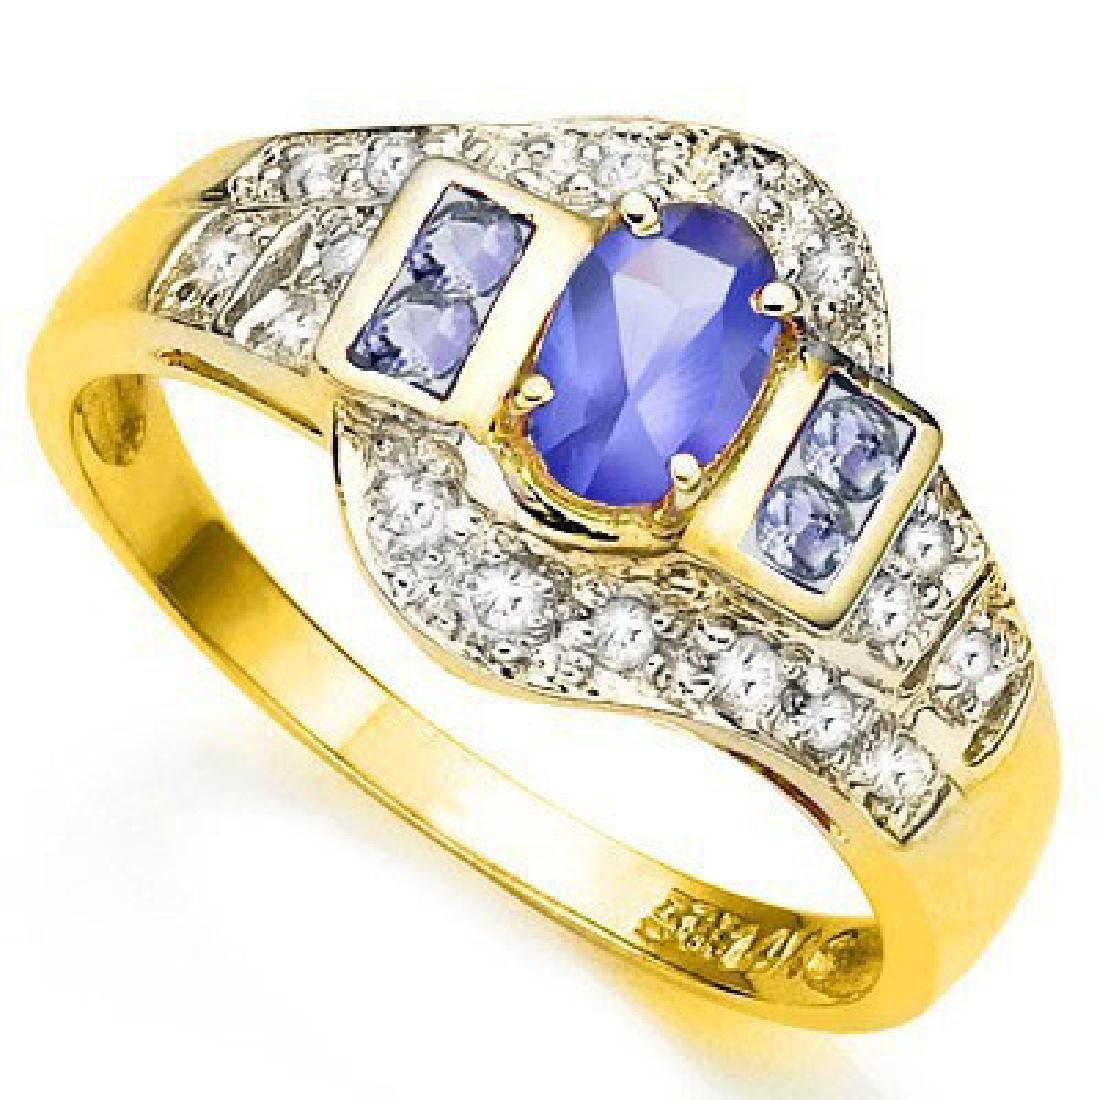 EXQUISITE 10K GOLD GENUINE TANZANITE/DIAMOND RING